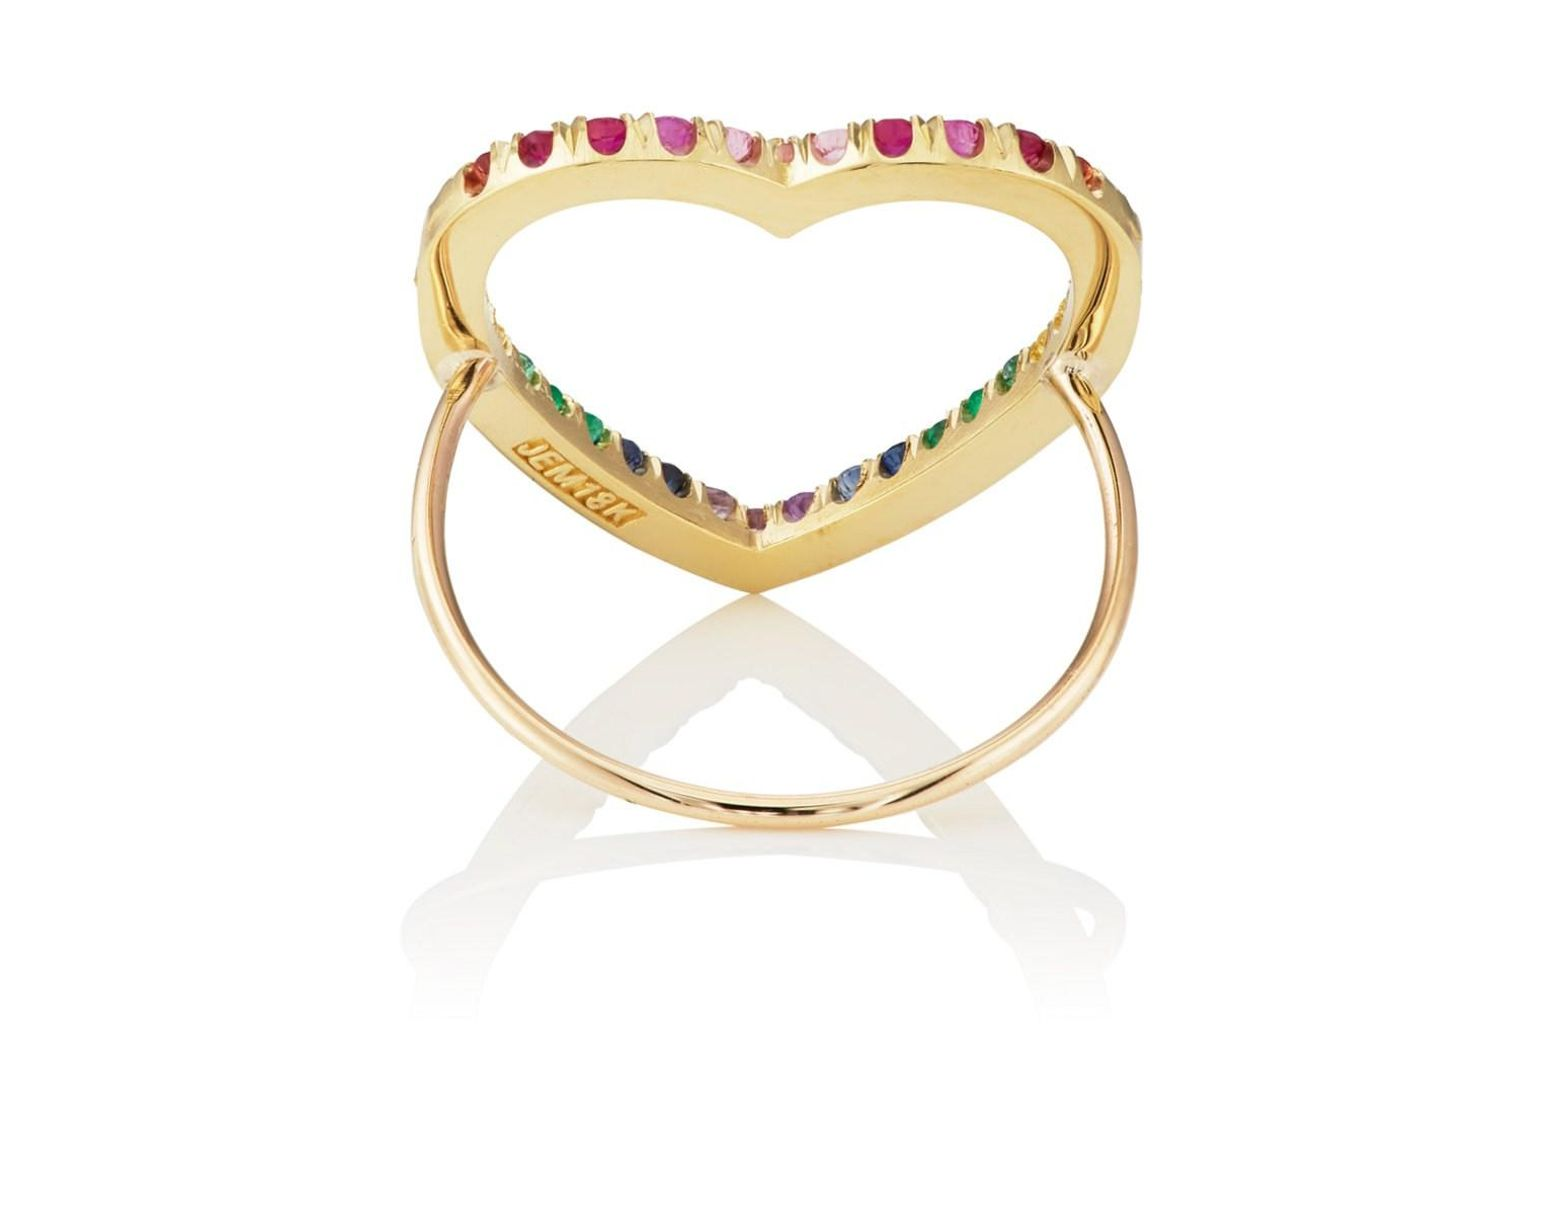 cabdffbab5d2f9 Jennifer Meyer Rainbow Open Heart Ring Size 6.5 - Lyst